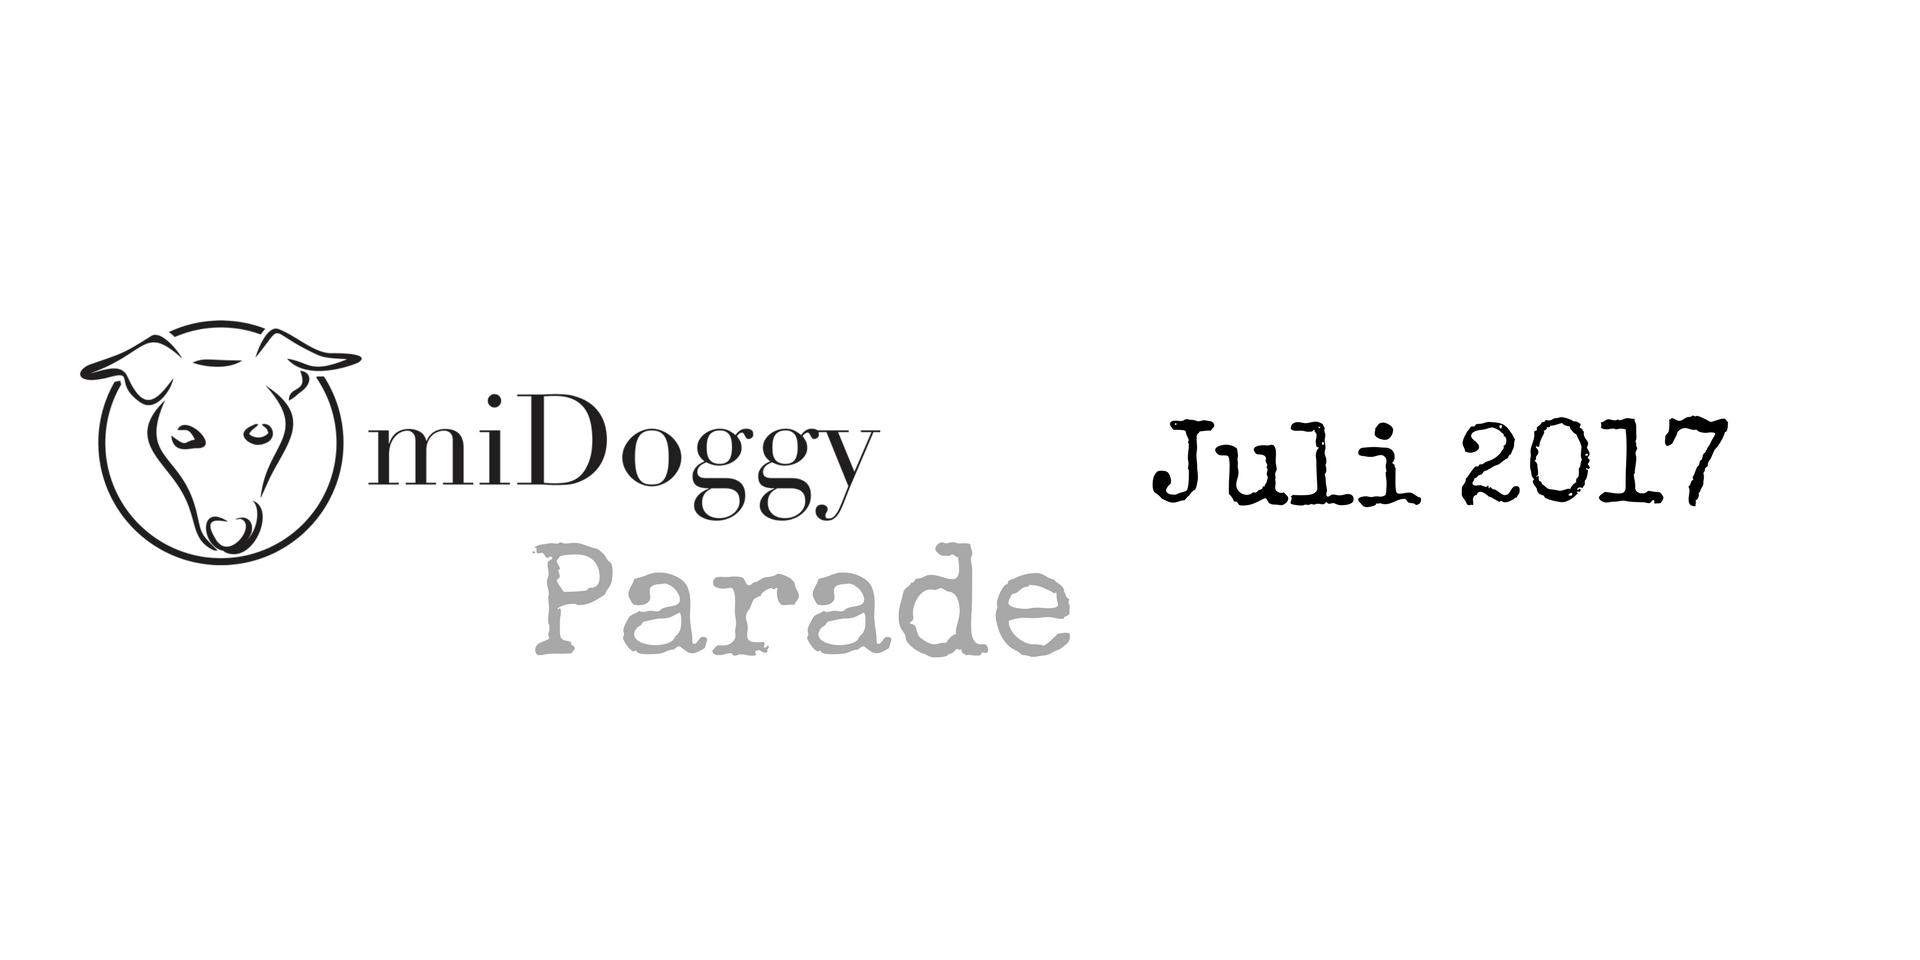 miDoggy Parade Blogparade Hundeblogger Juli 2017